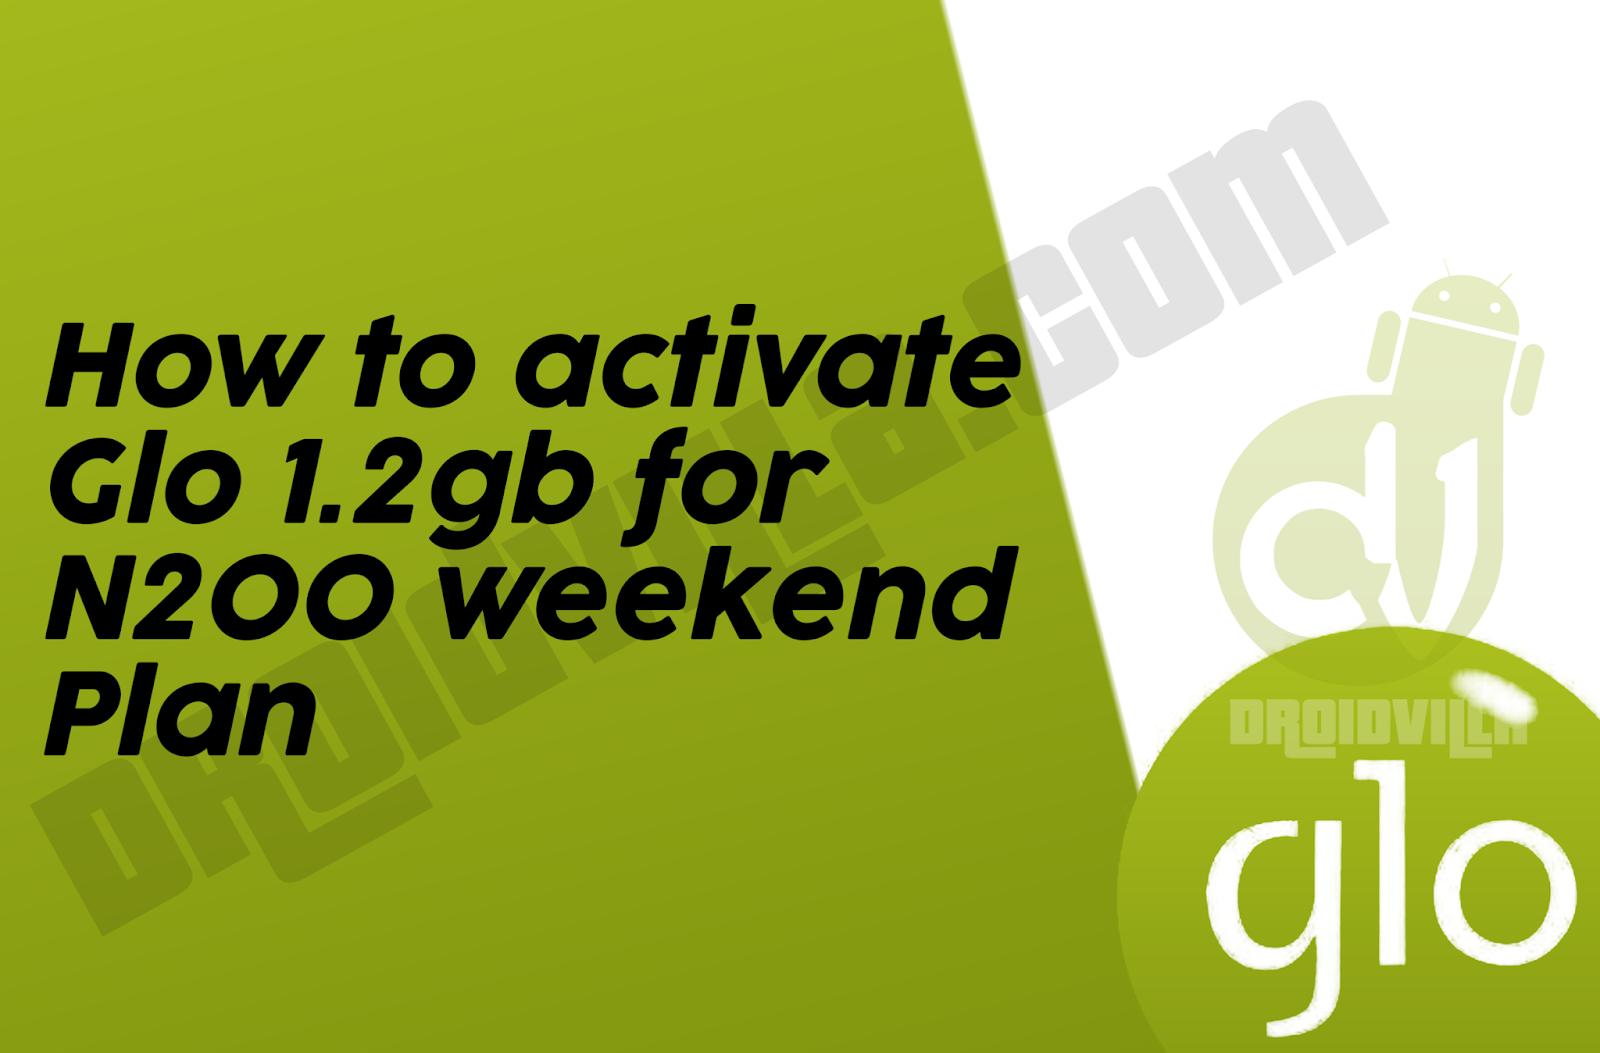 Glo weekend plan 1.2gb